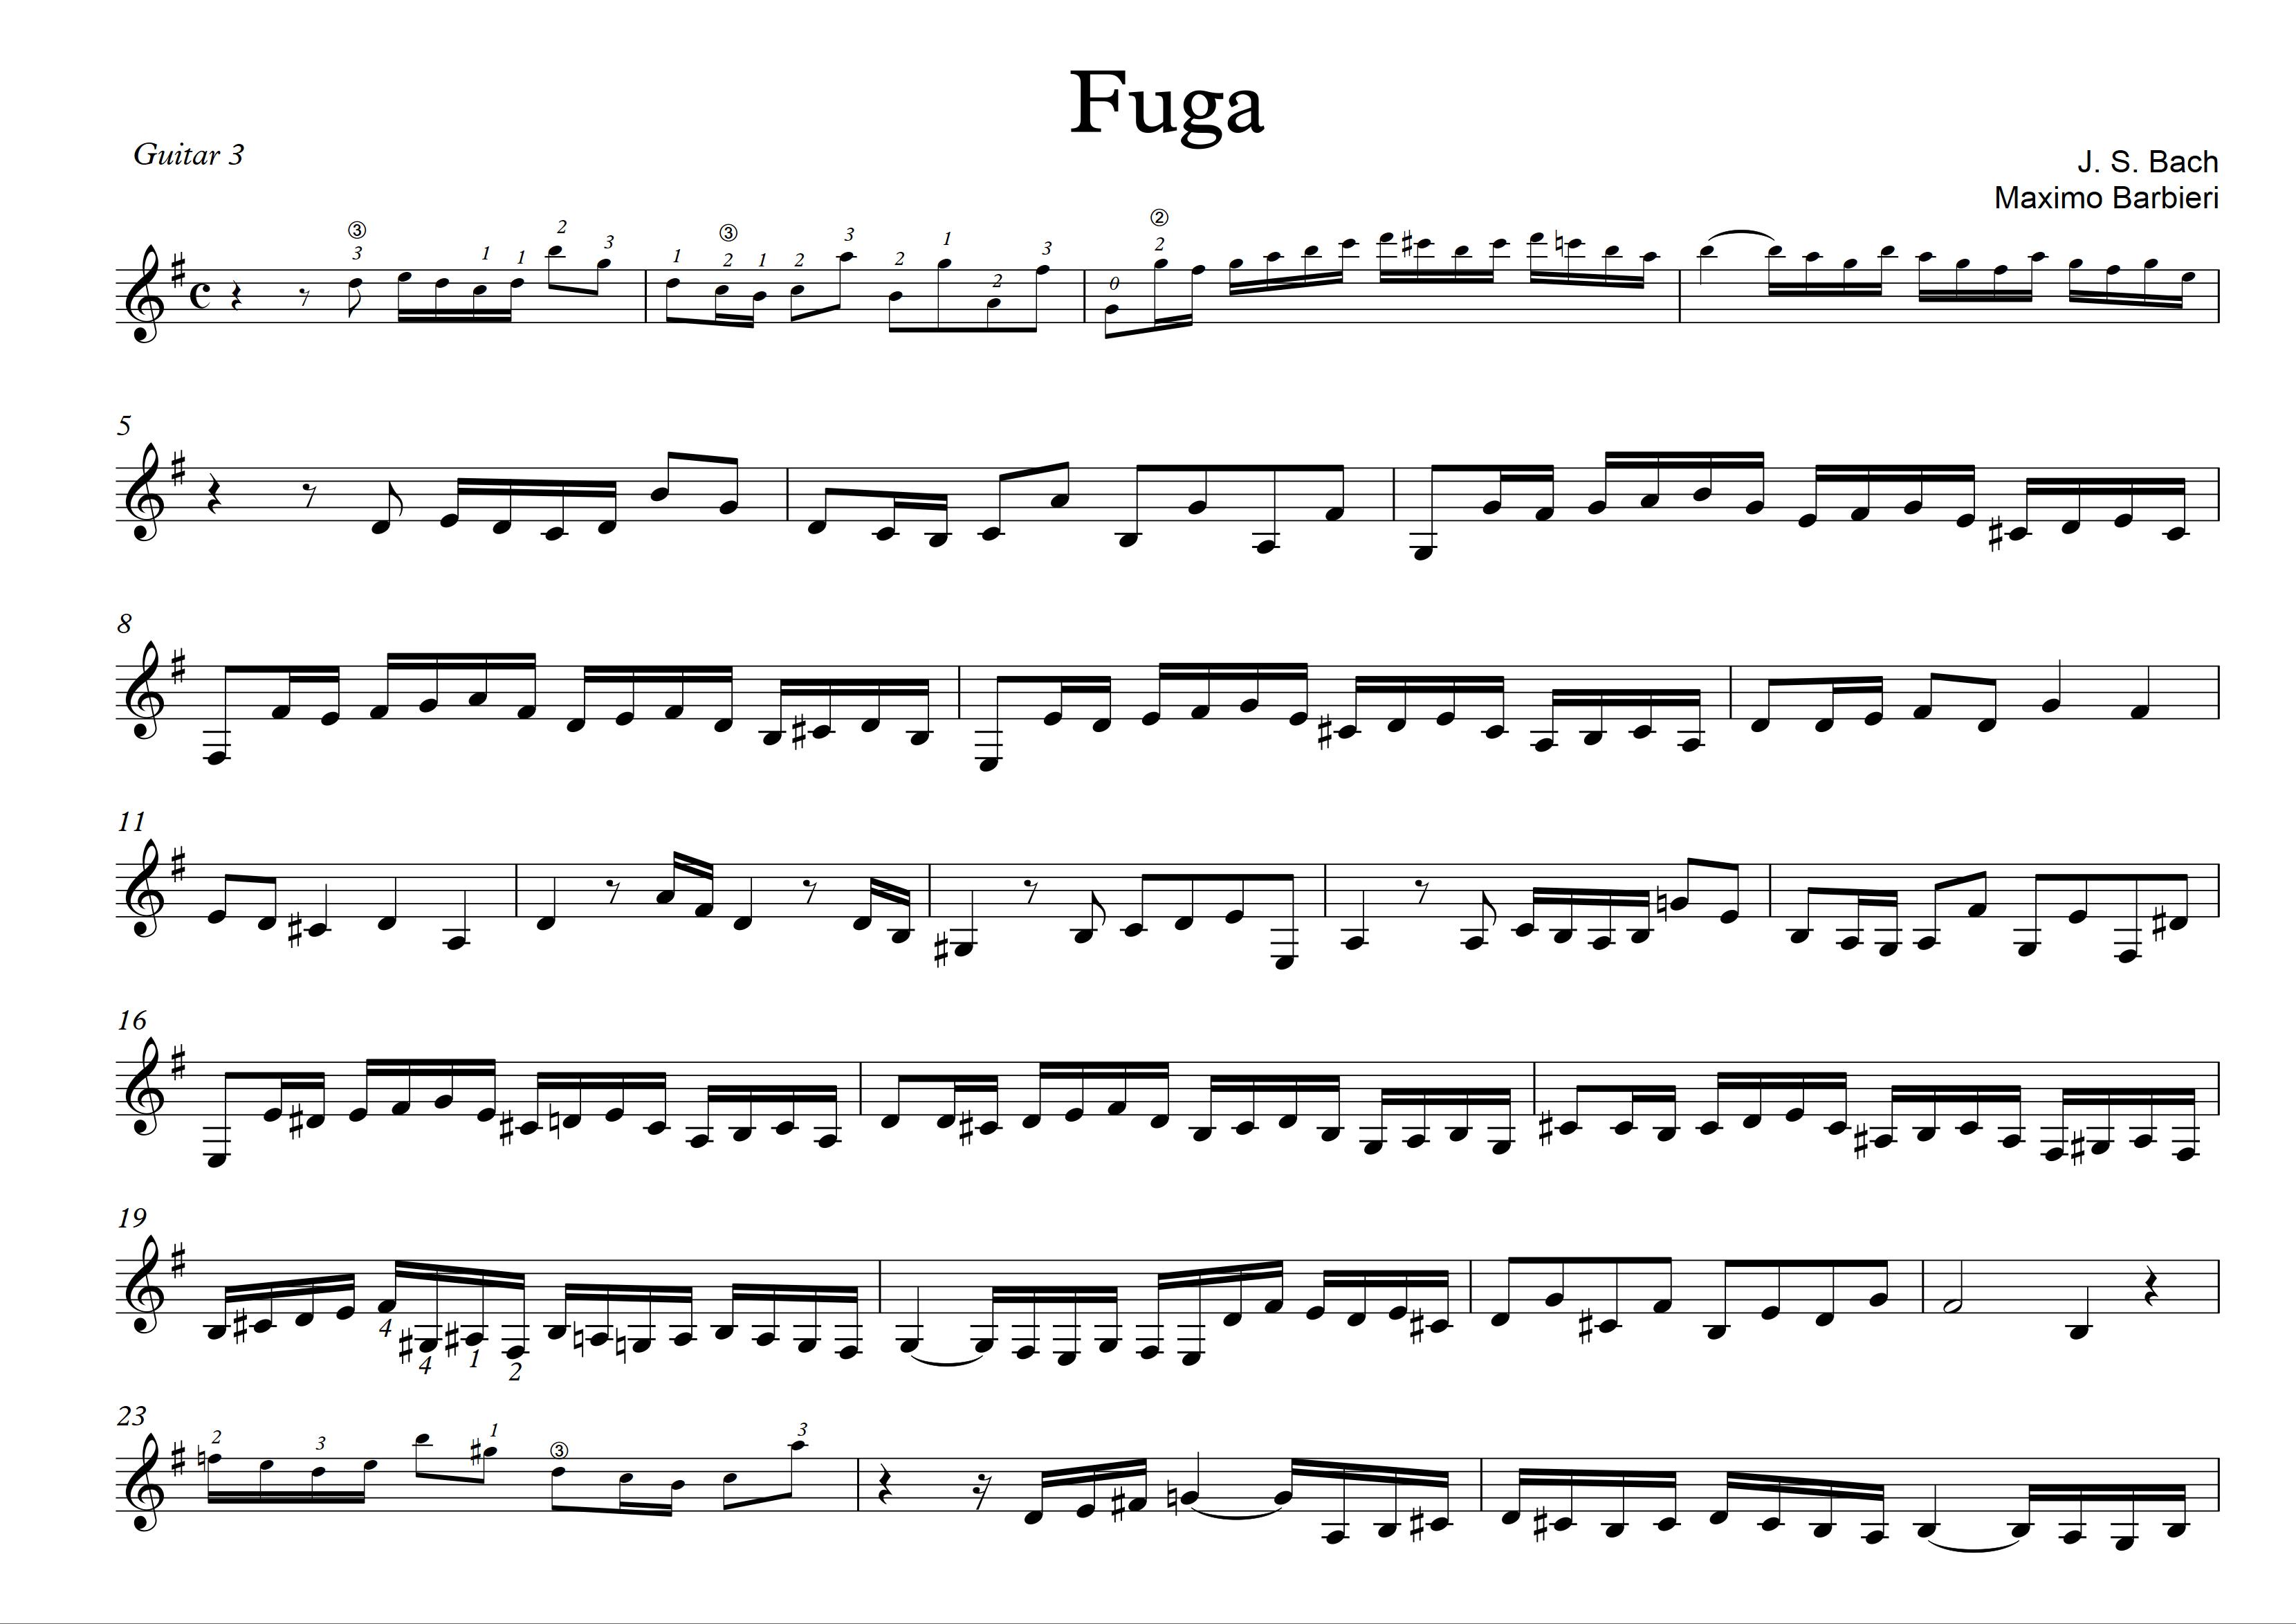 Fuga - Bach - Maximo Barbieri - 3 -1